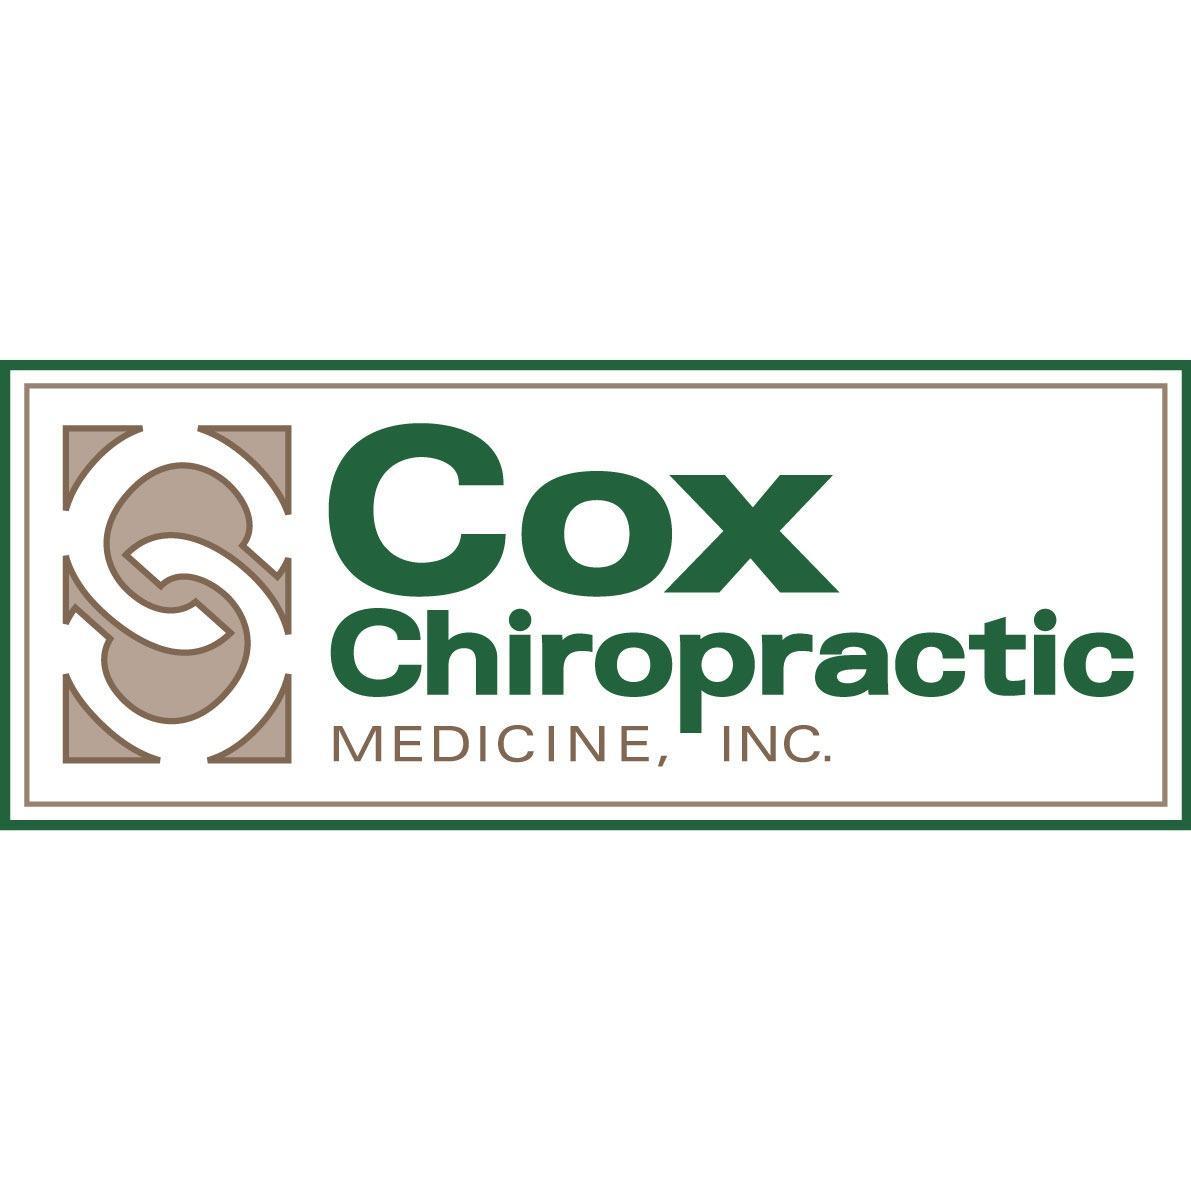 Cox Chiropractic Medicine INC